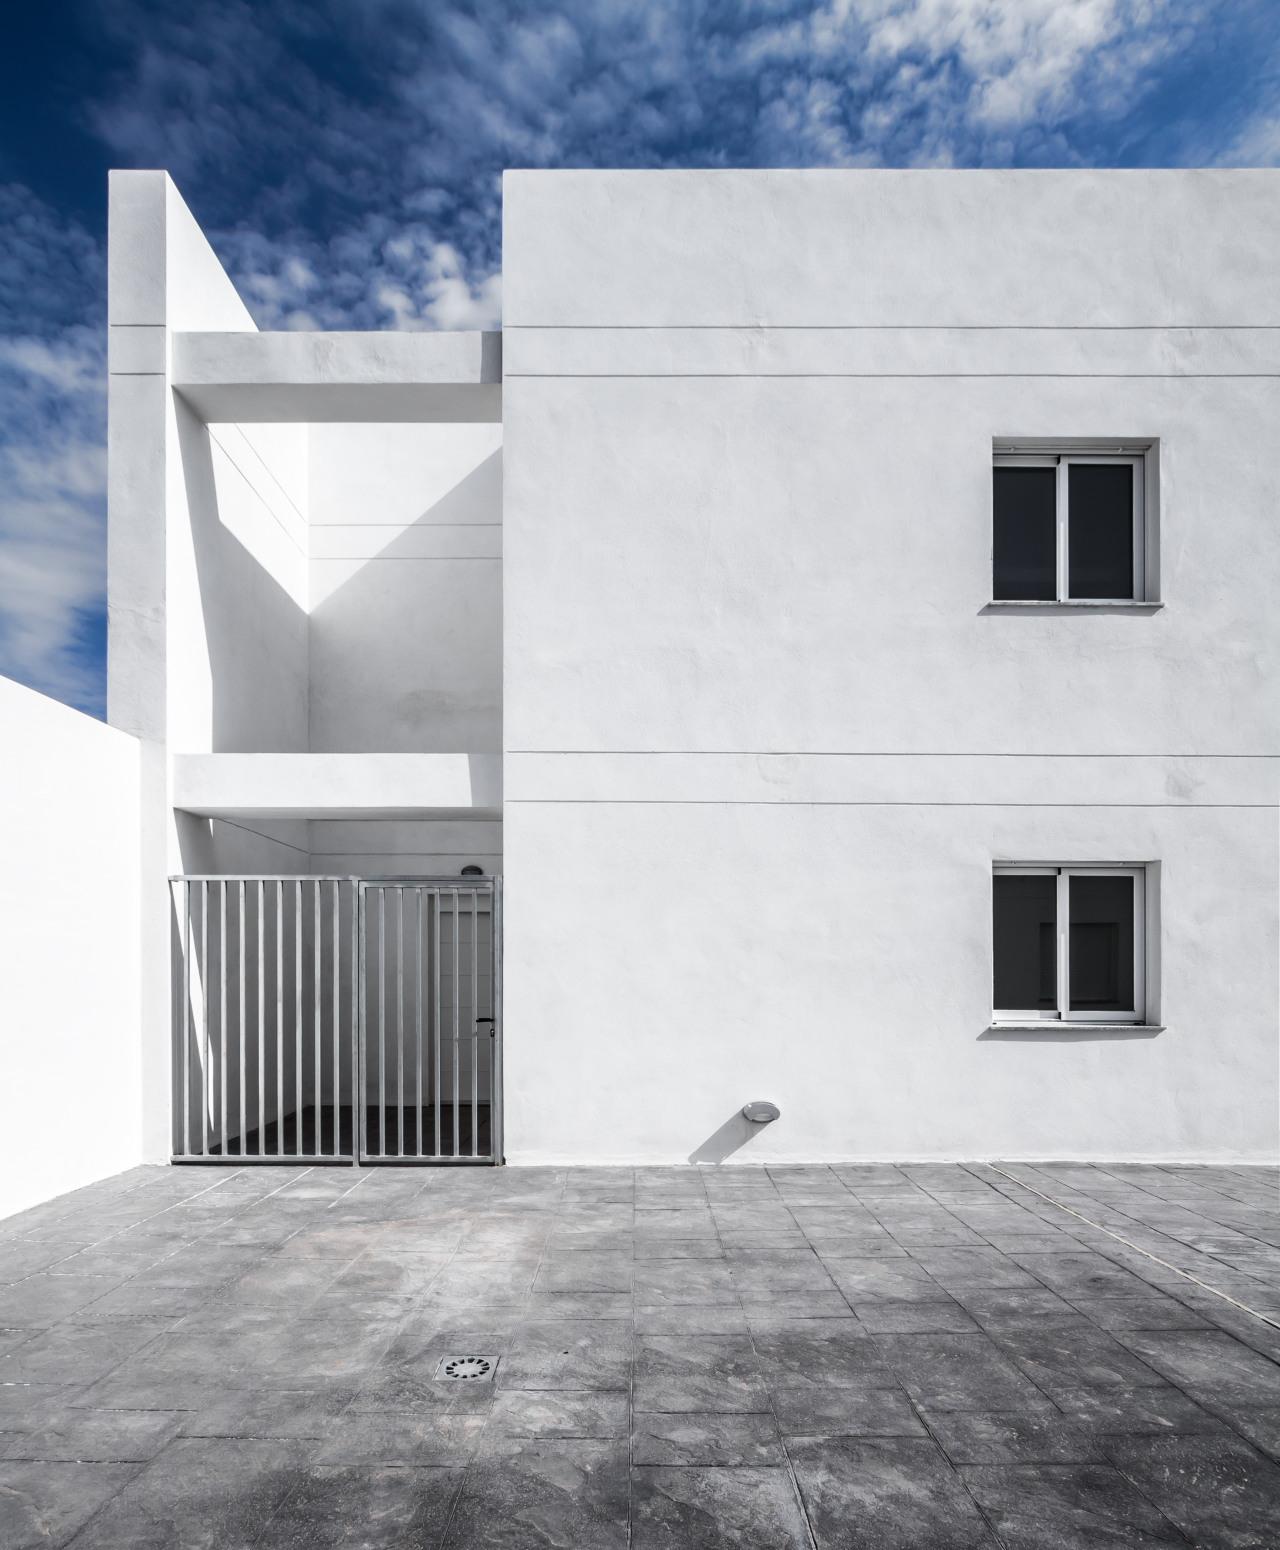 fotografia-arquitectura-valencia-german-cabo-viraje-sagunto (9)